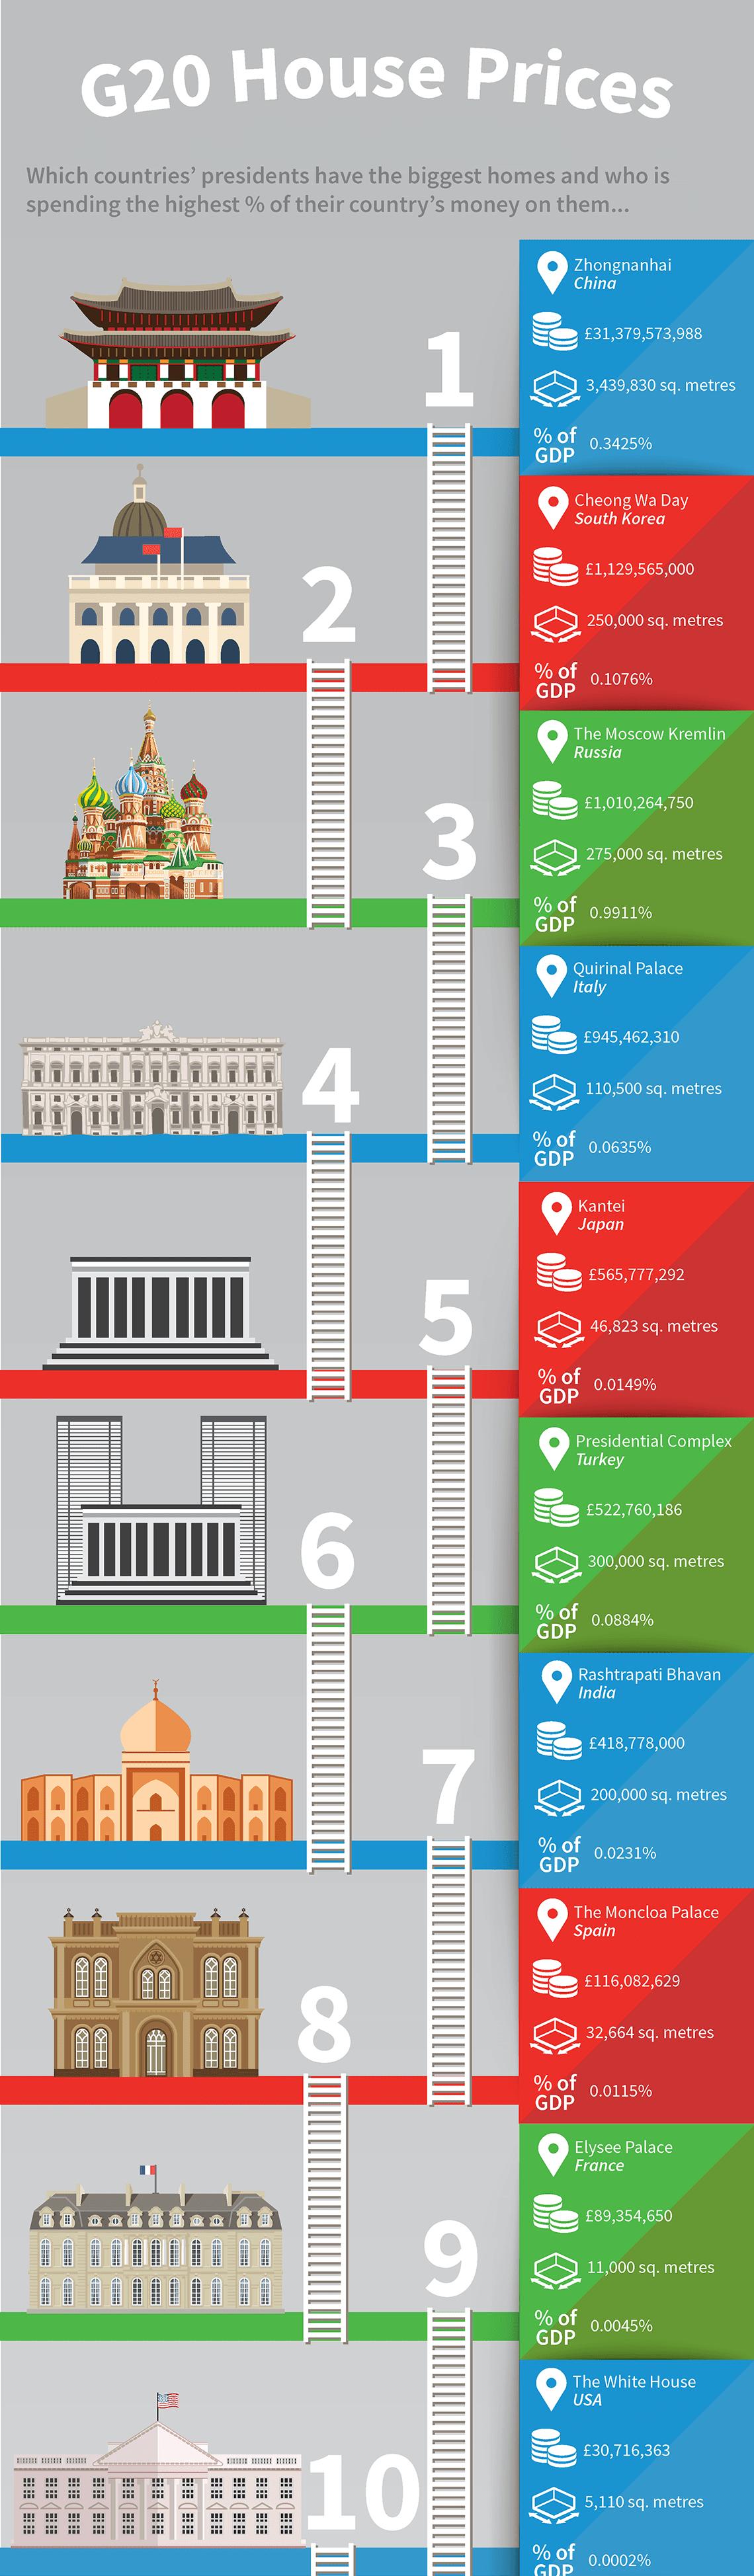 2016-12-07-g20-infographic-1